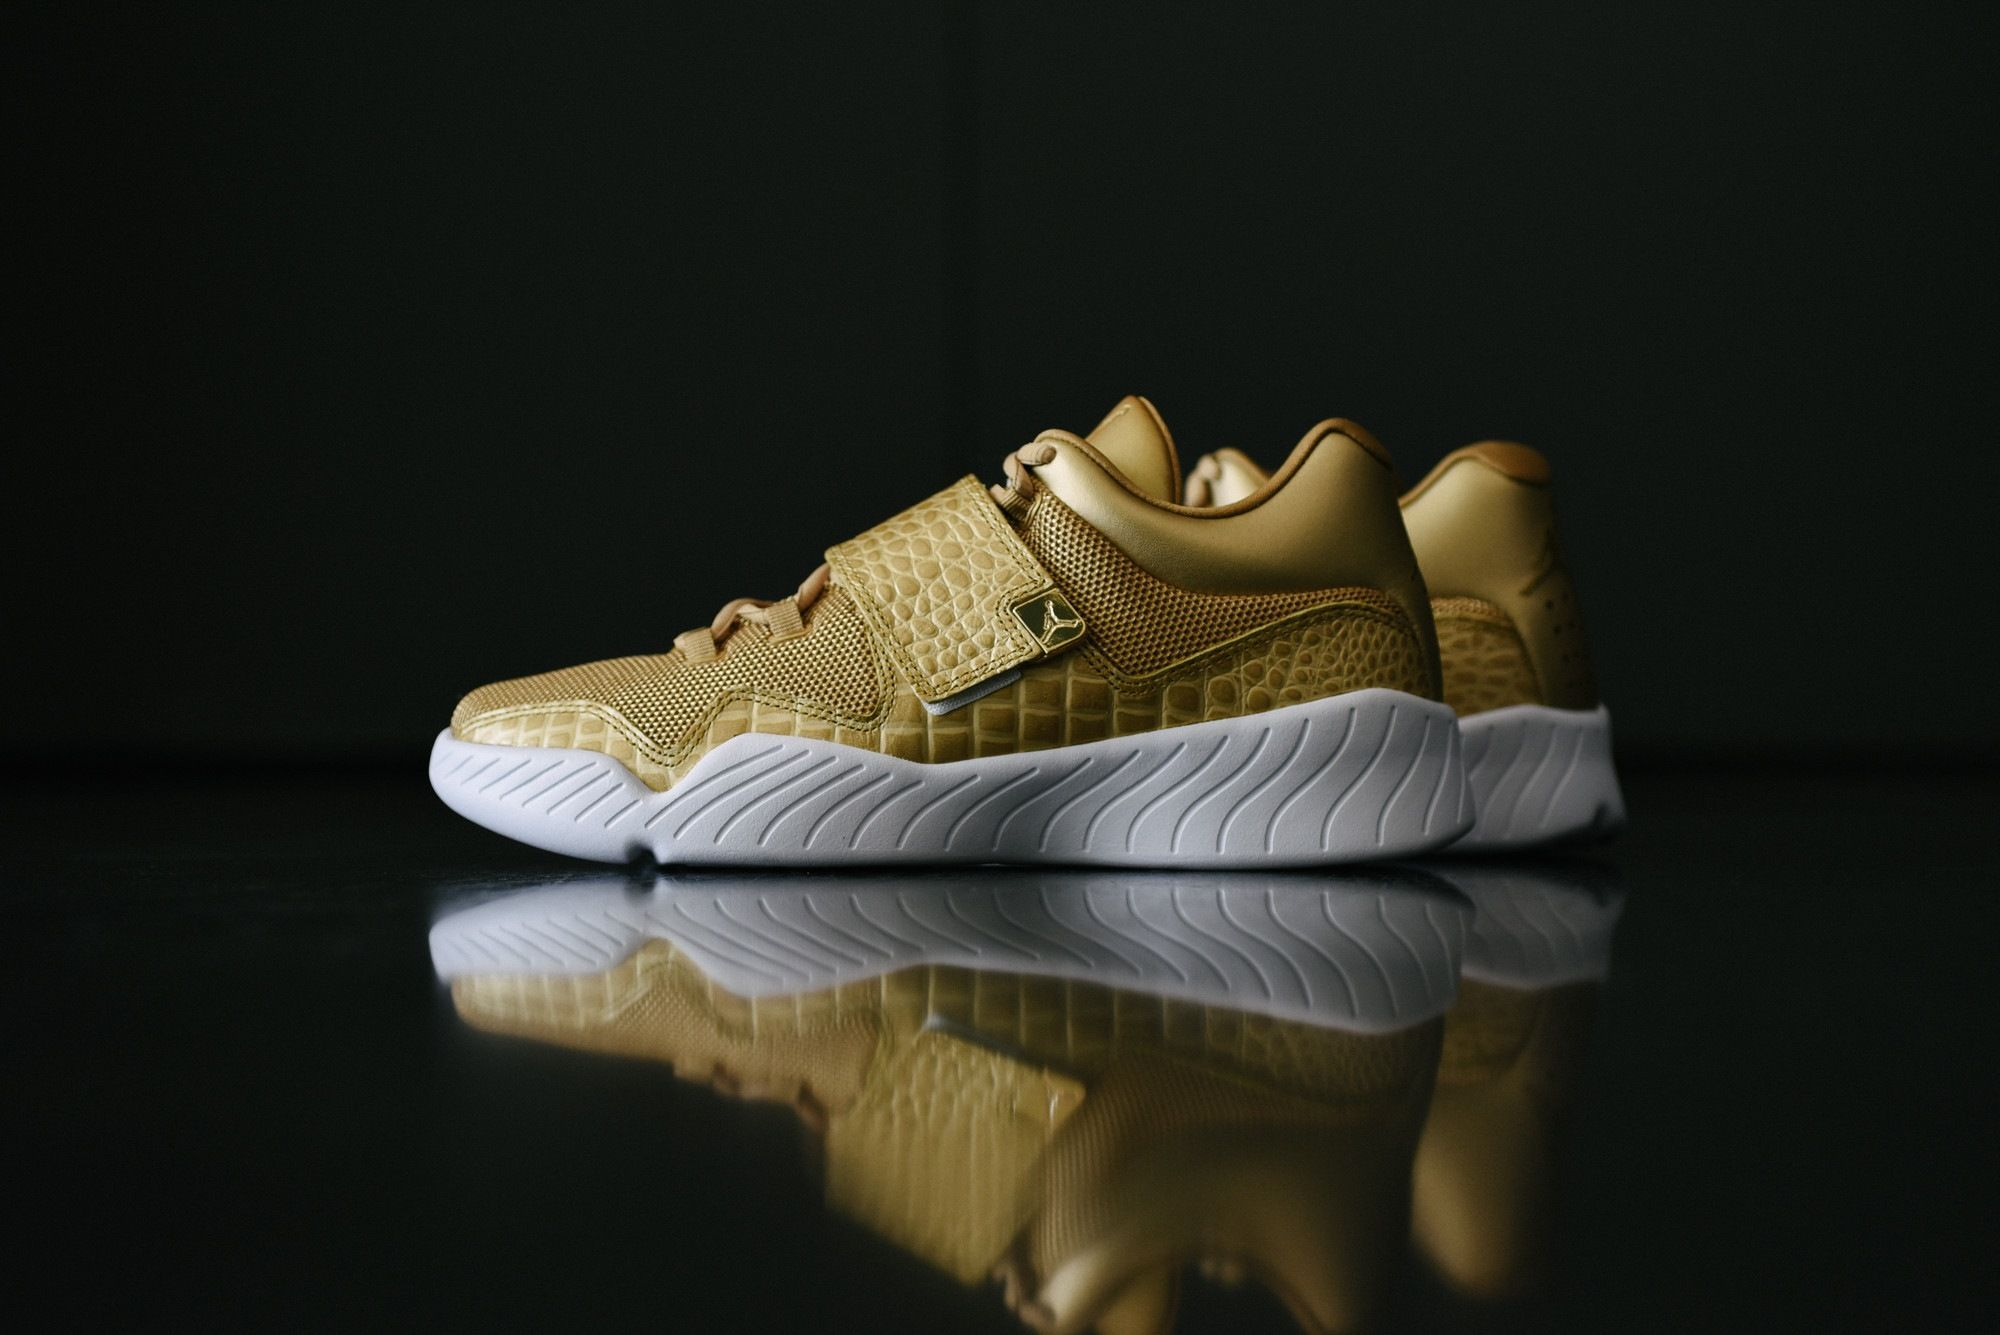 Nike Air Jordan J23 Metallic Gold 854557 700 Sneaker Politics 1041